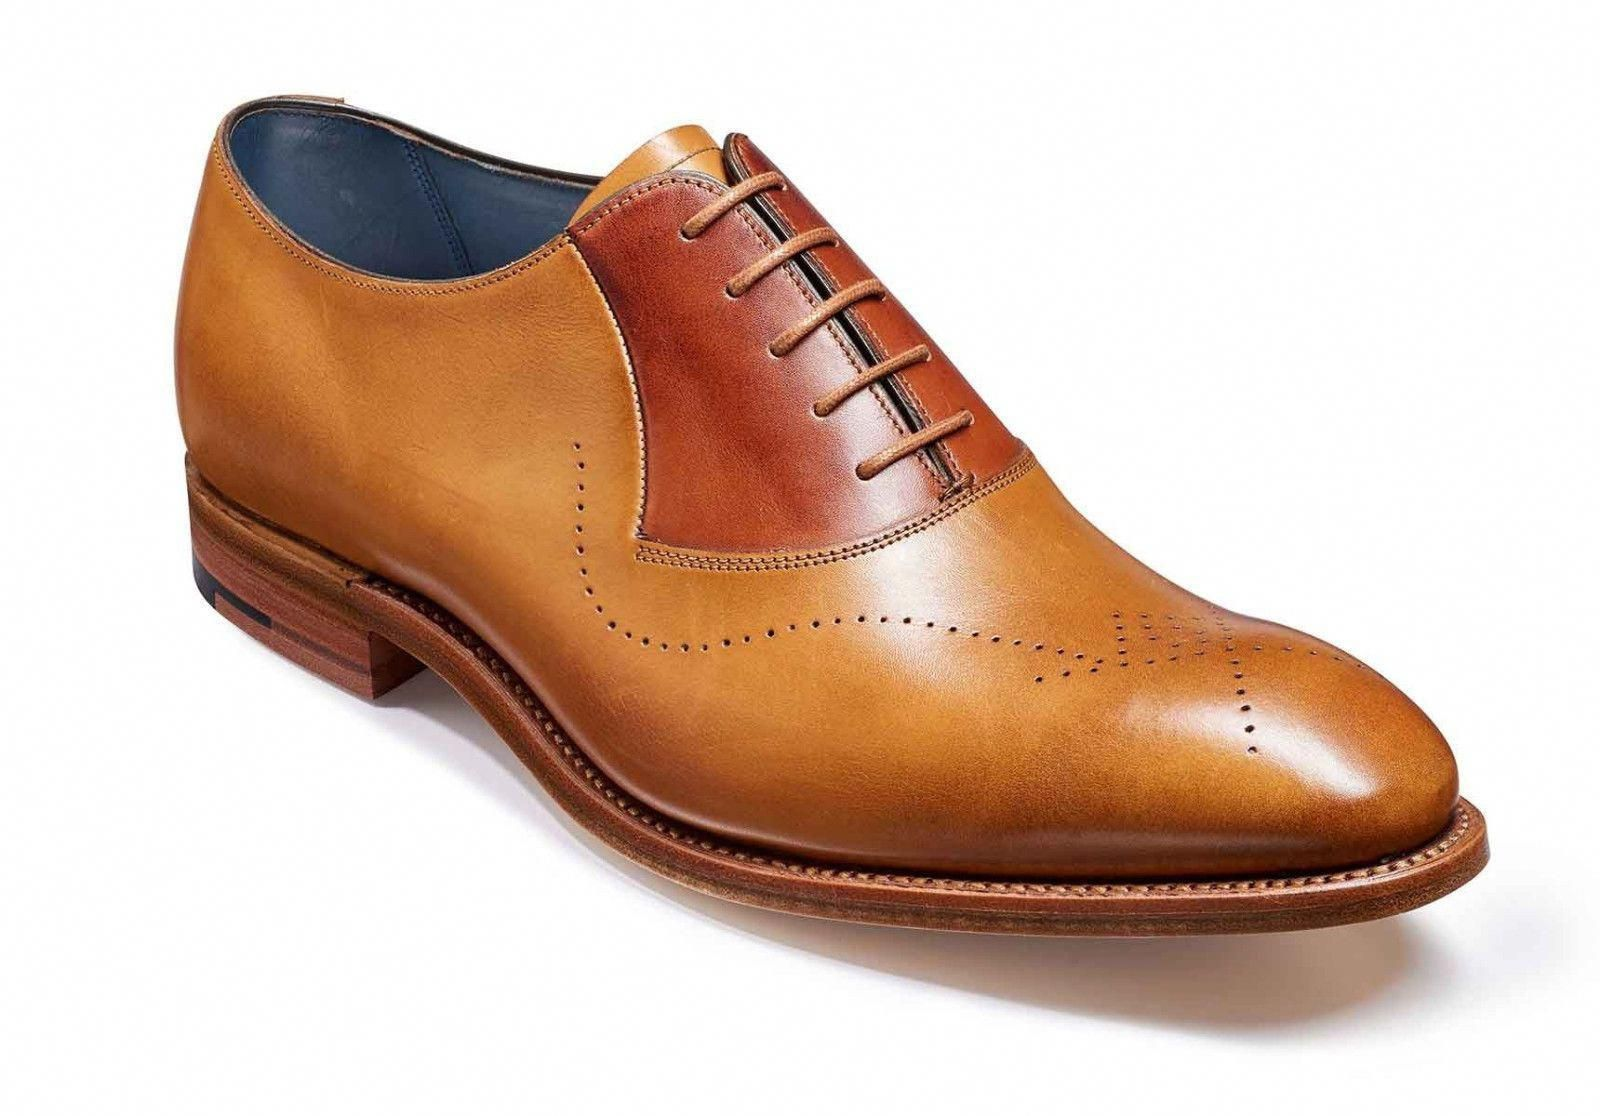 9350029caed Pin de Fernando Islas en Calzado de Caballero - Mens Shoes en 2019 | Zapatos  caballero, Zapatos y Calzas